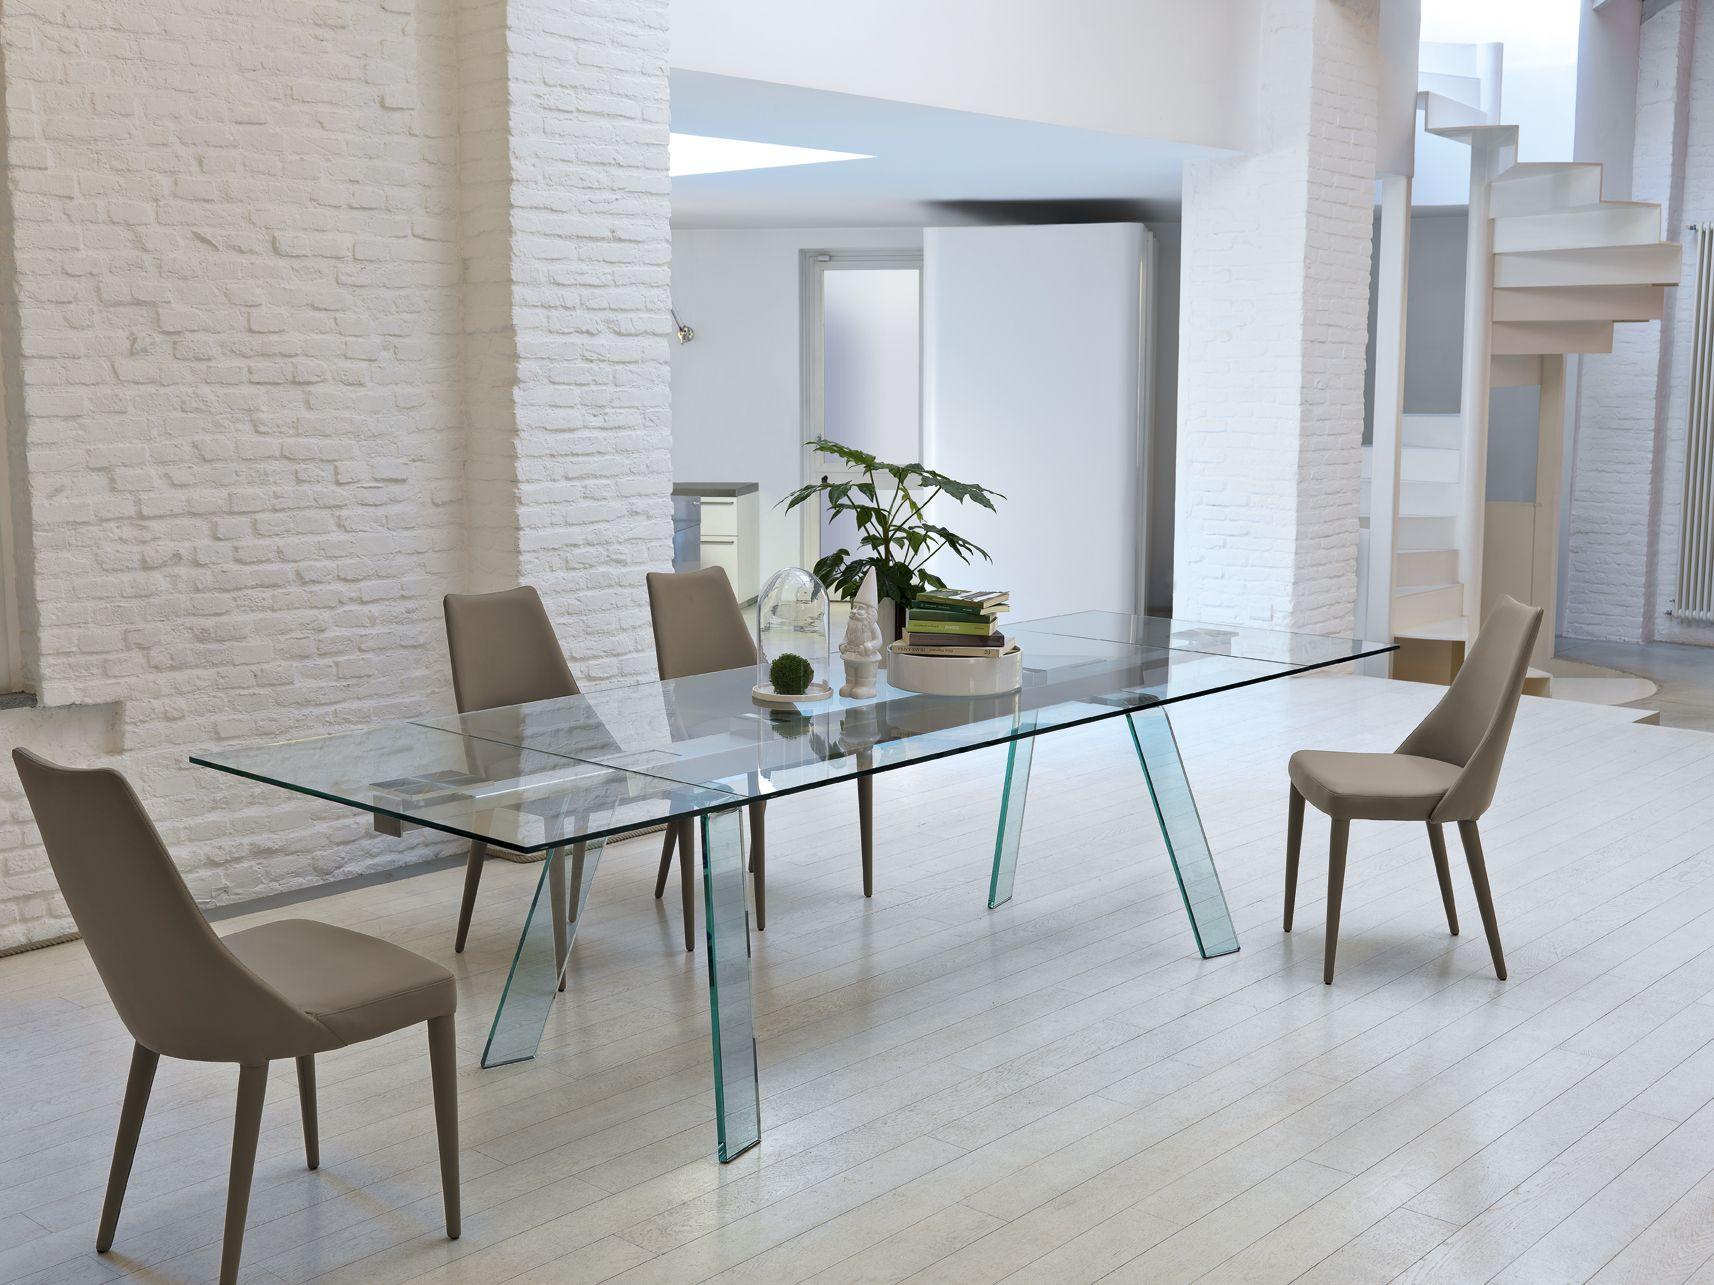 Toronto Table Extendable Version By Midj Design Studio Kappa Chair